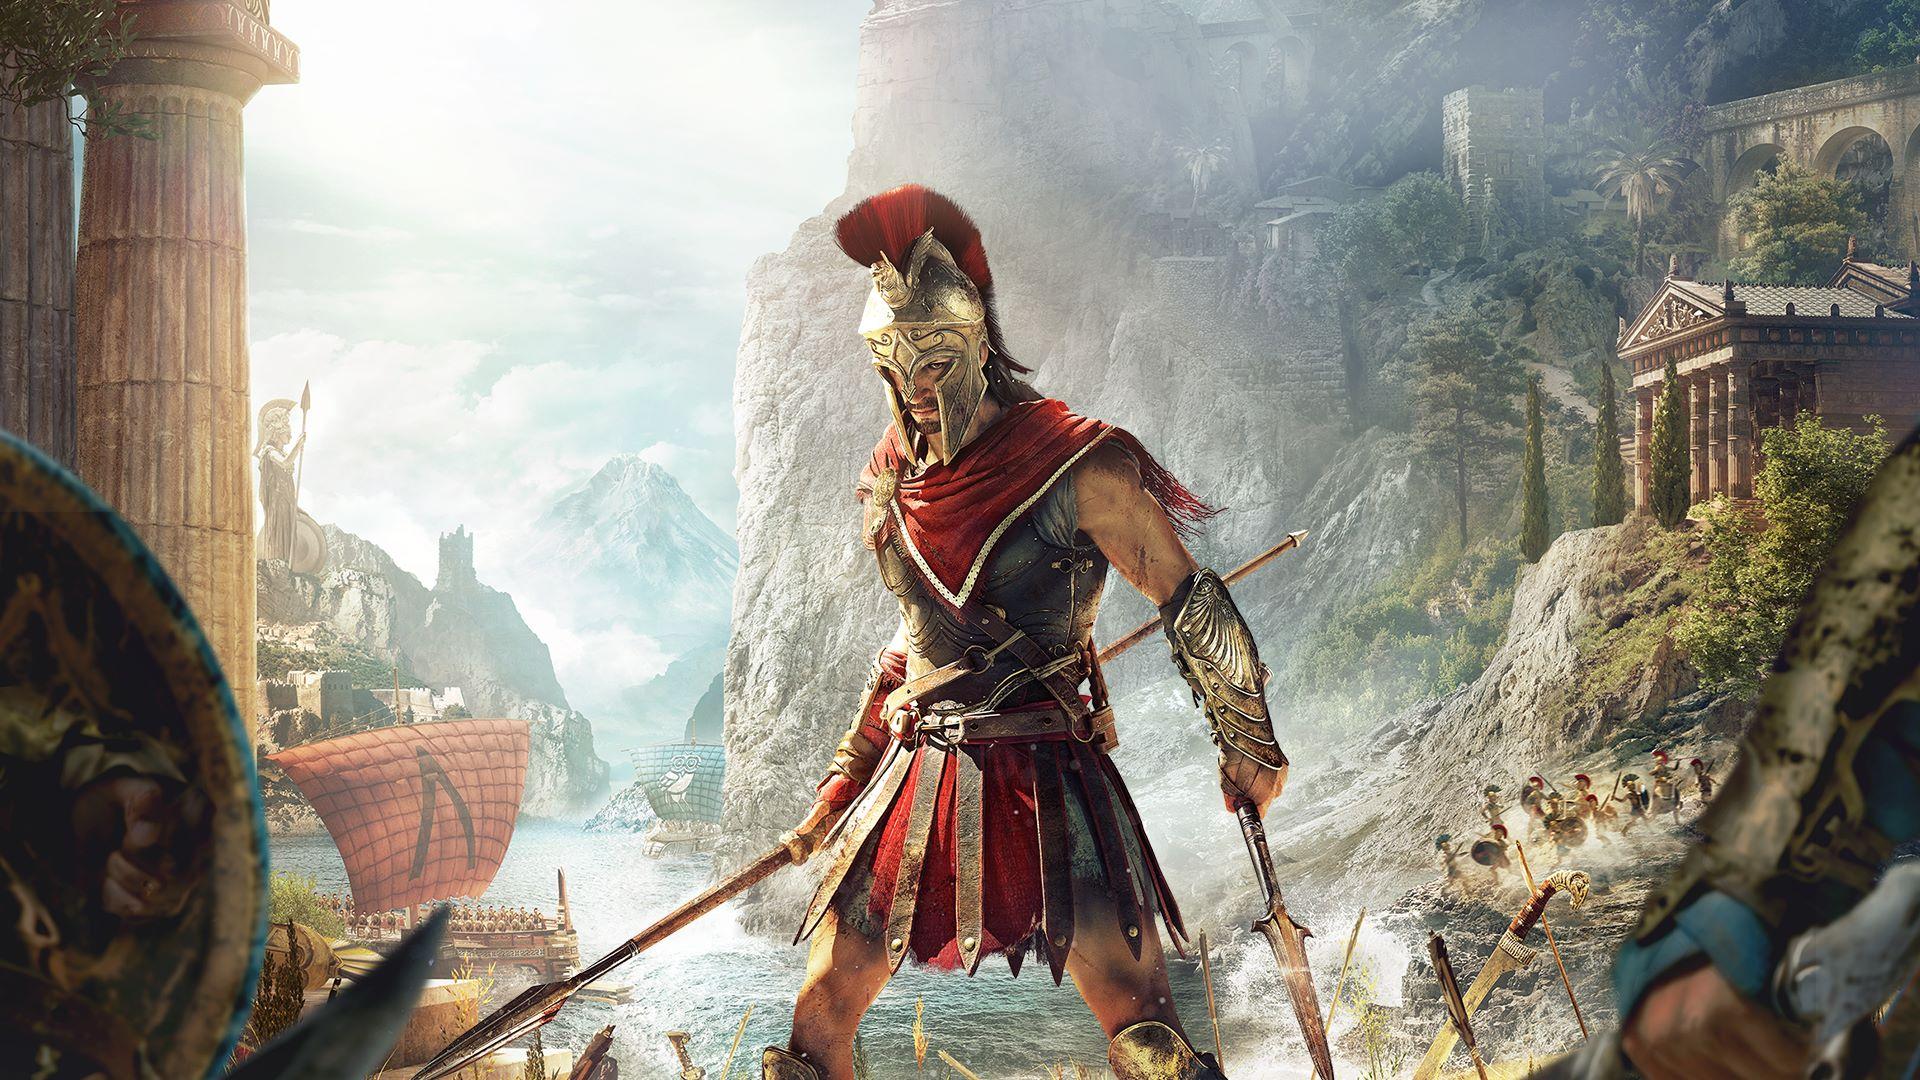 Assassin's Creed Odyssey: mejoras en una saga clásica que por fin llegó a una espectacular Grecia Antigua